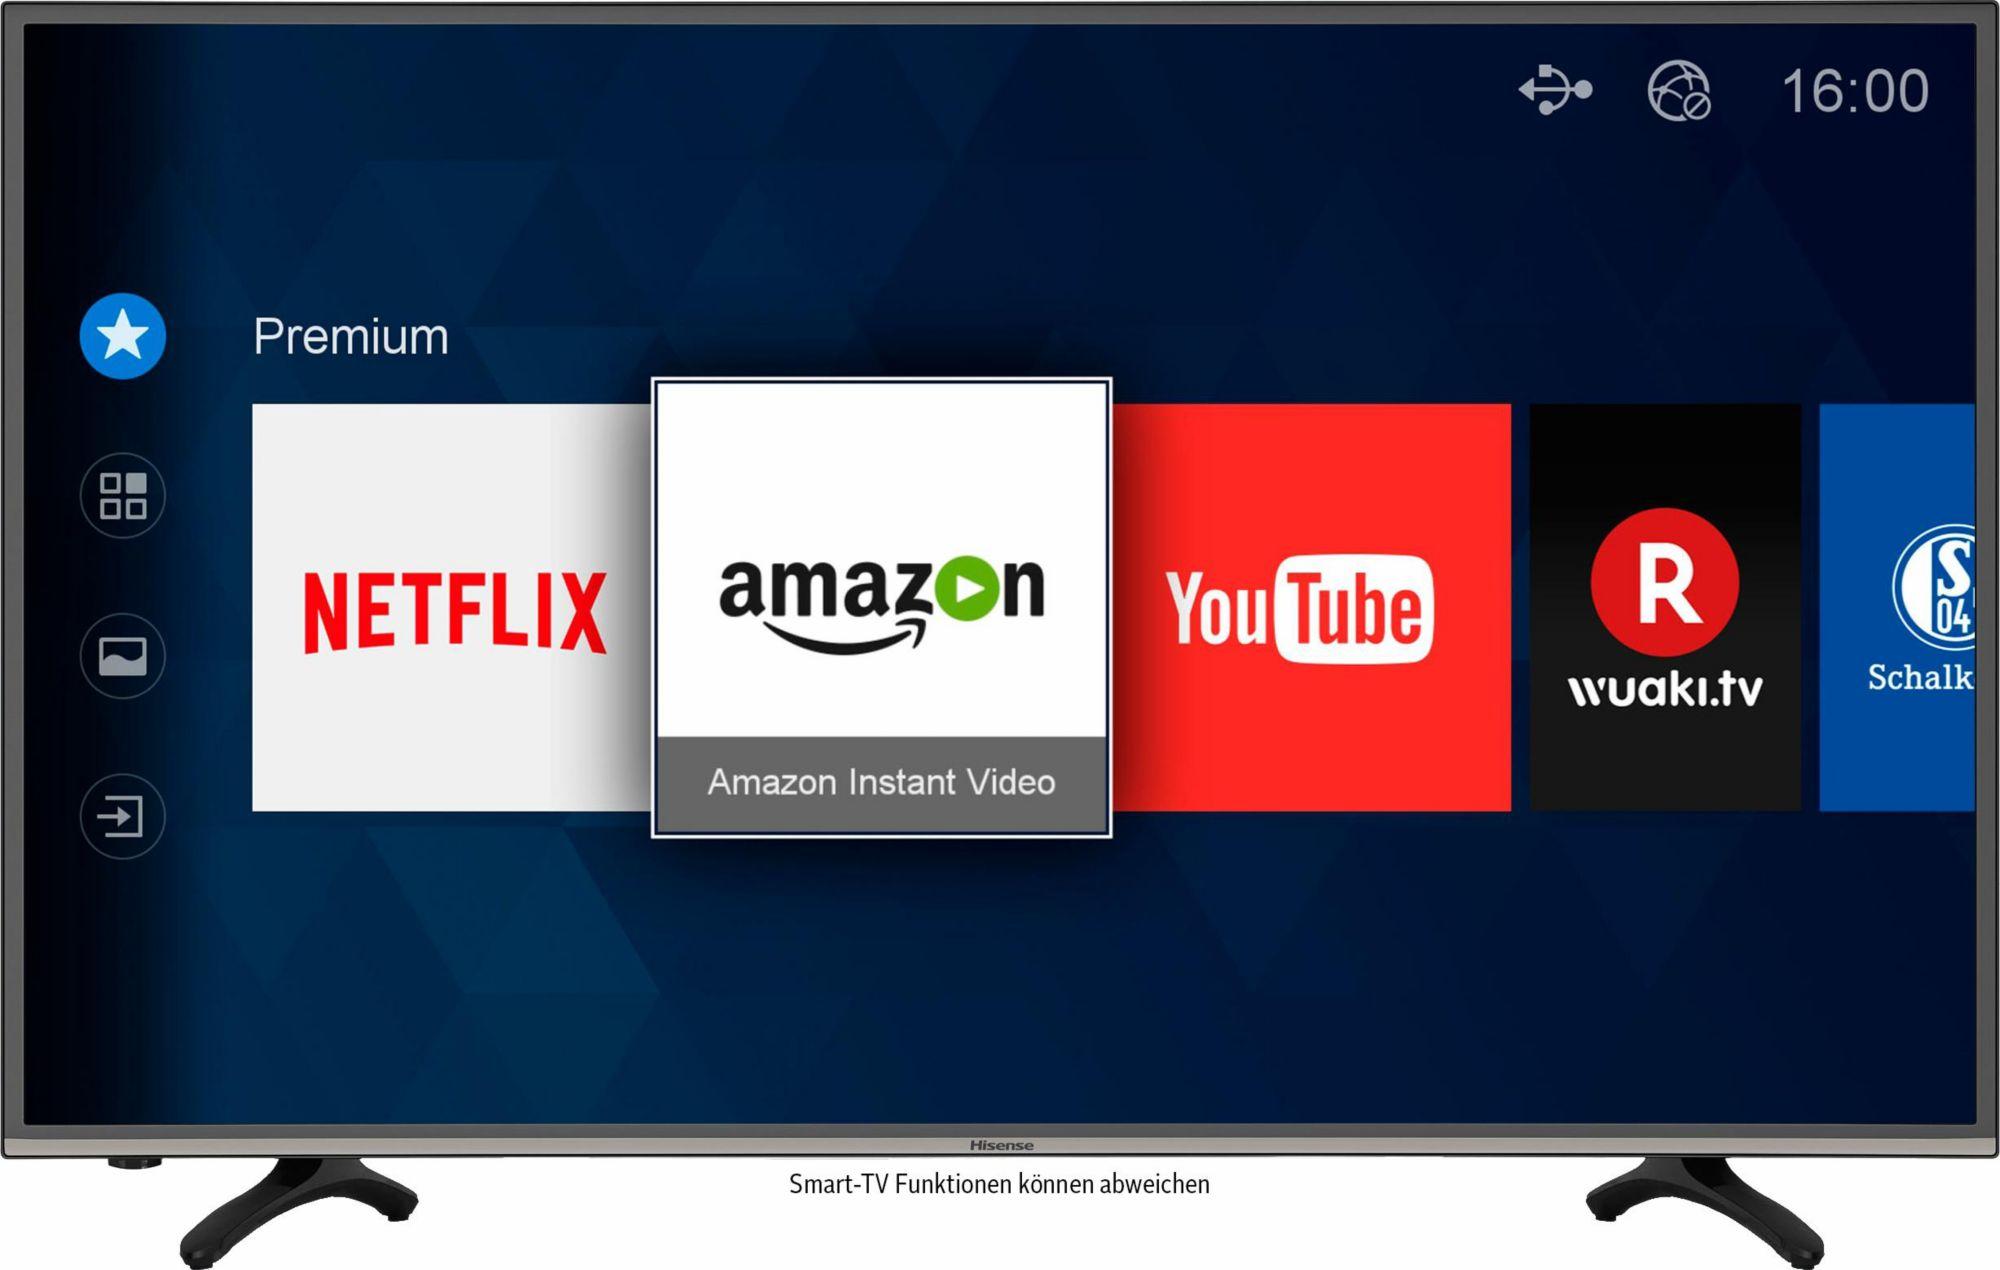 HISENSE Hisense H43MEC3050, LED Fernseher, 108 cm (43 Zoll), 2160p (4K Ultra HD), Smart-TV